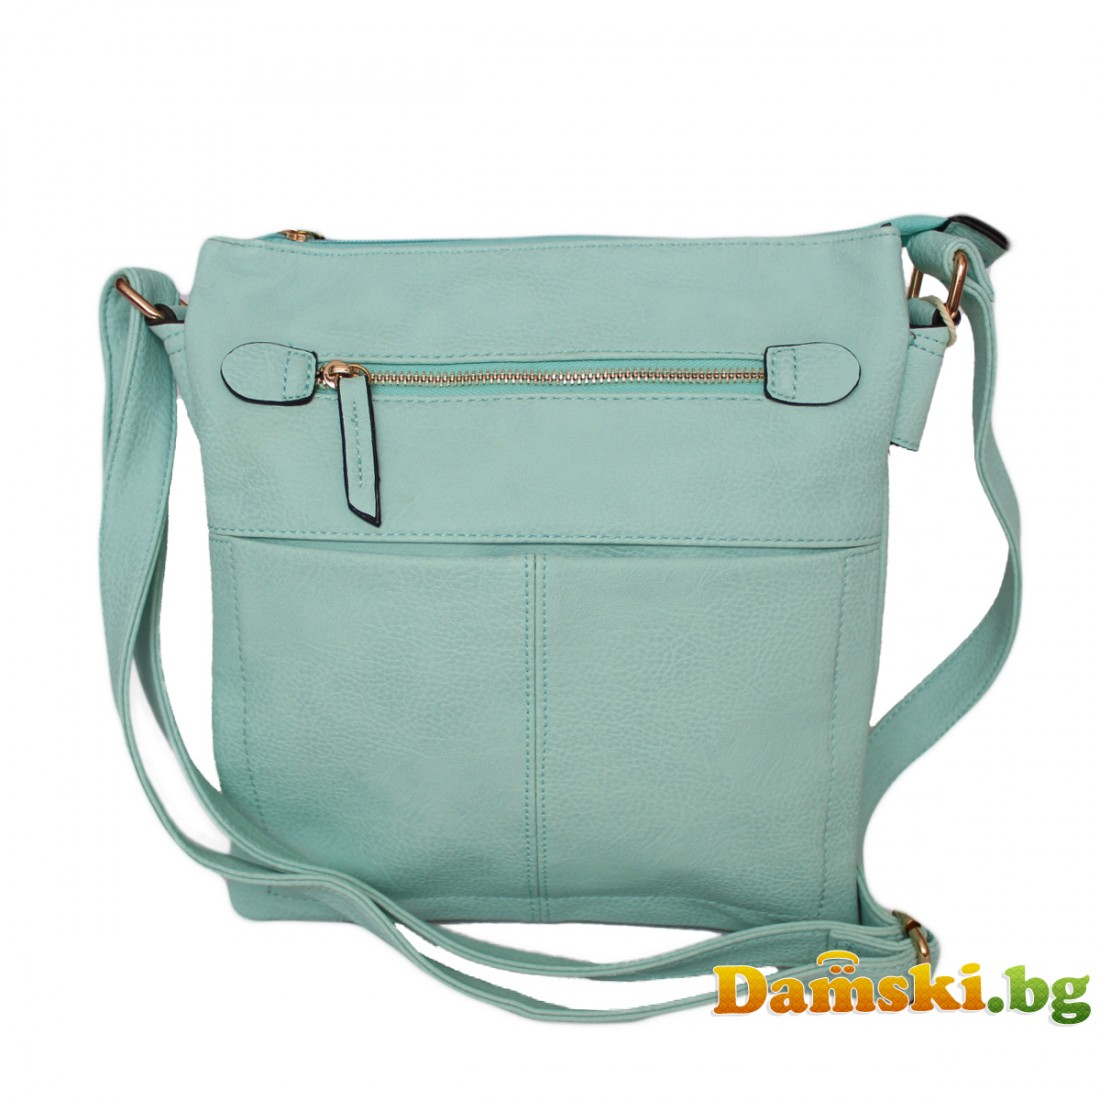 Дамска чанта през рамо Вероника - Мента